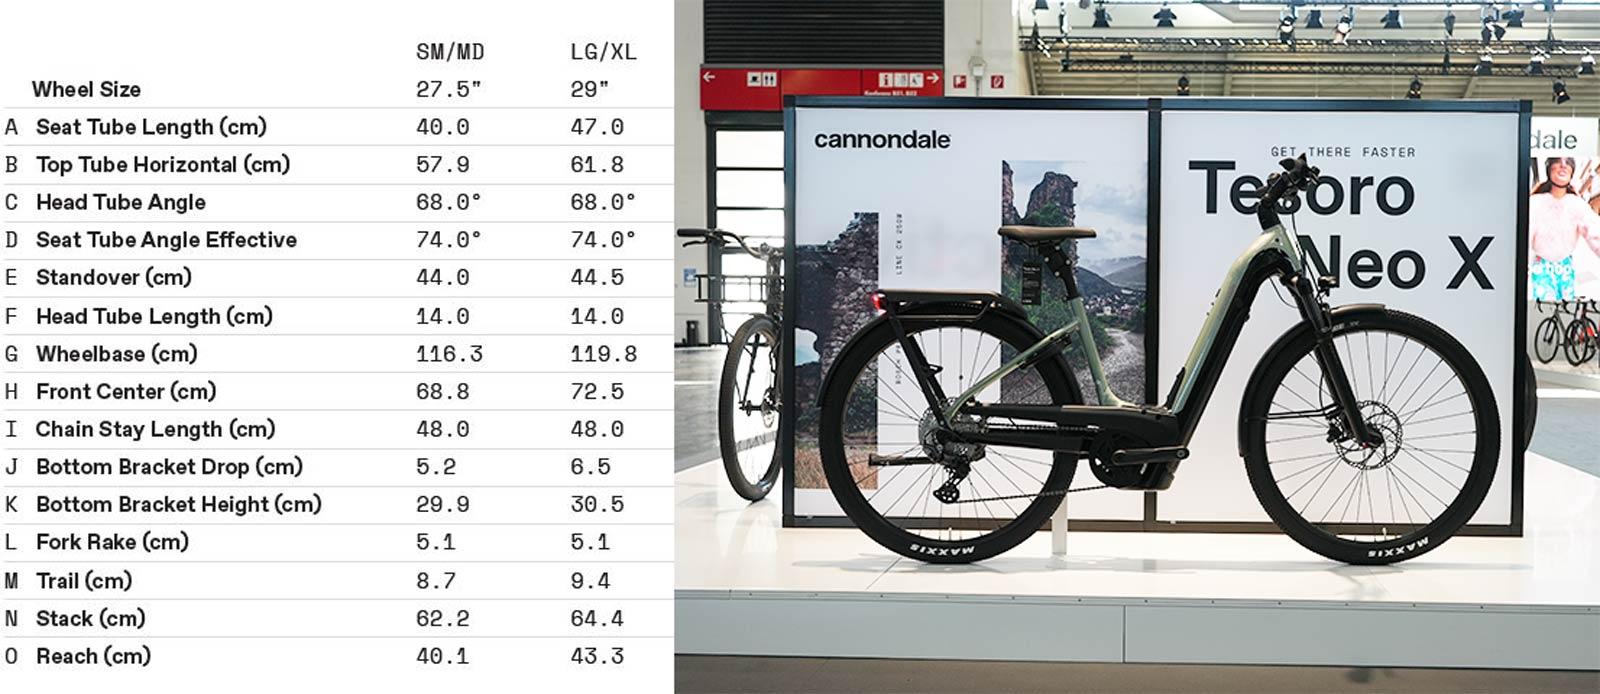 2022 Cannondale Tesoro Neo X low step-thru Geometry Chart